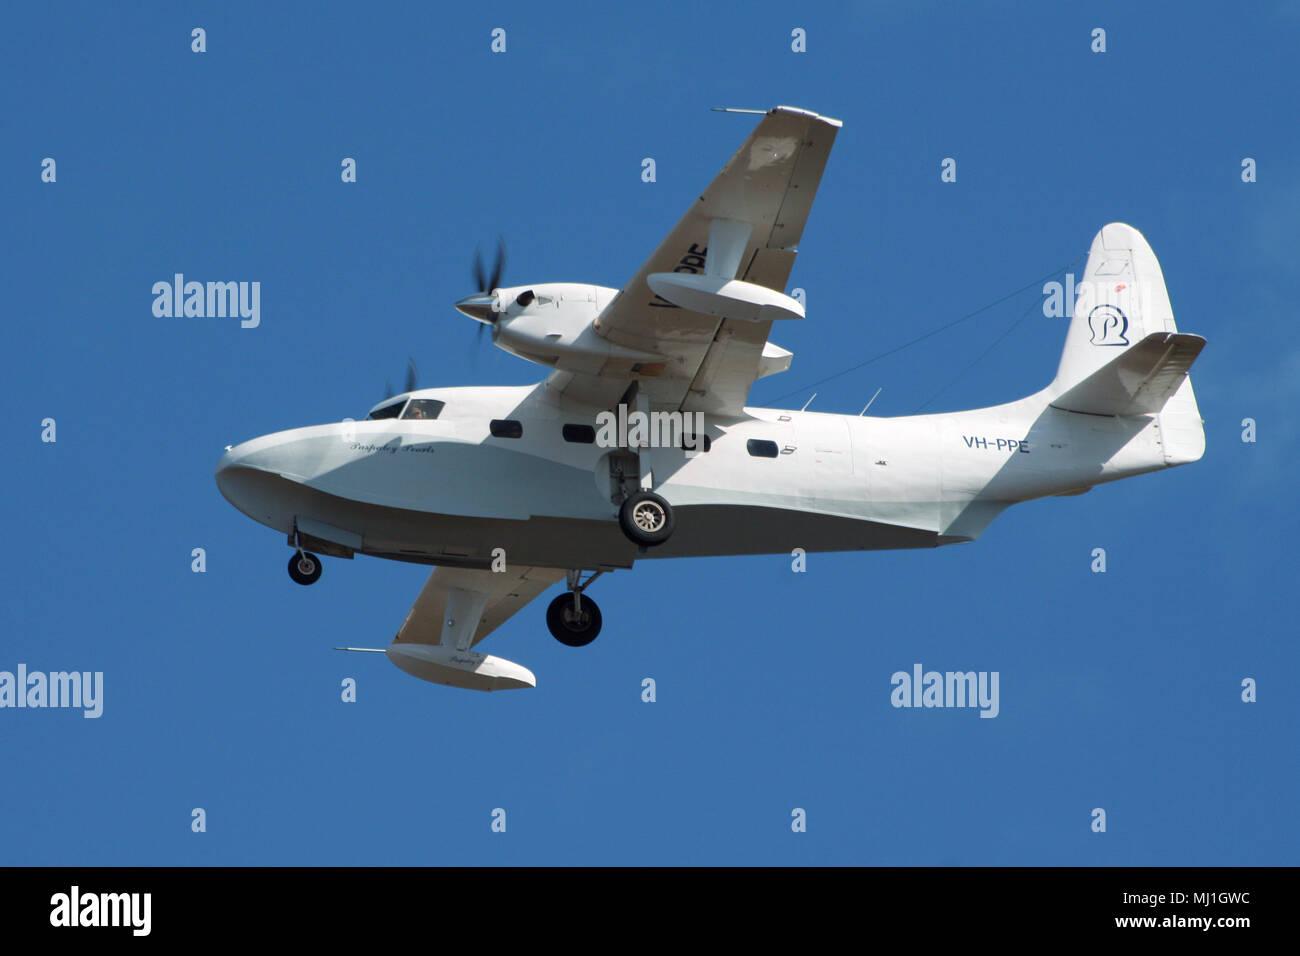 DARWIN, AUSTRALIA - JUL 7, 2006: Grumman G-73T Turbo Mallard twin-engined amphibious plane from Paspaley Pearls (Pearl Aviation) landing on Darwin Air - Stock Image